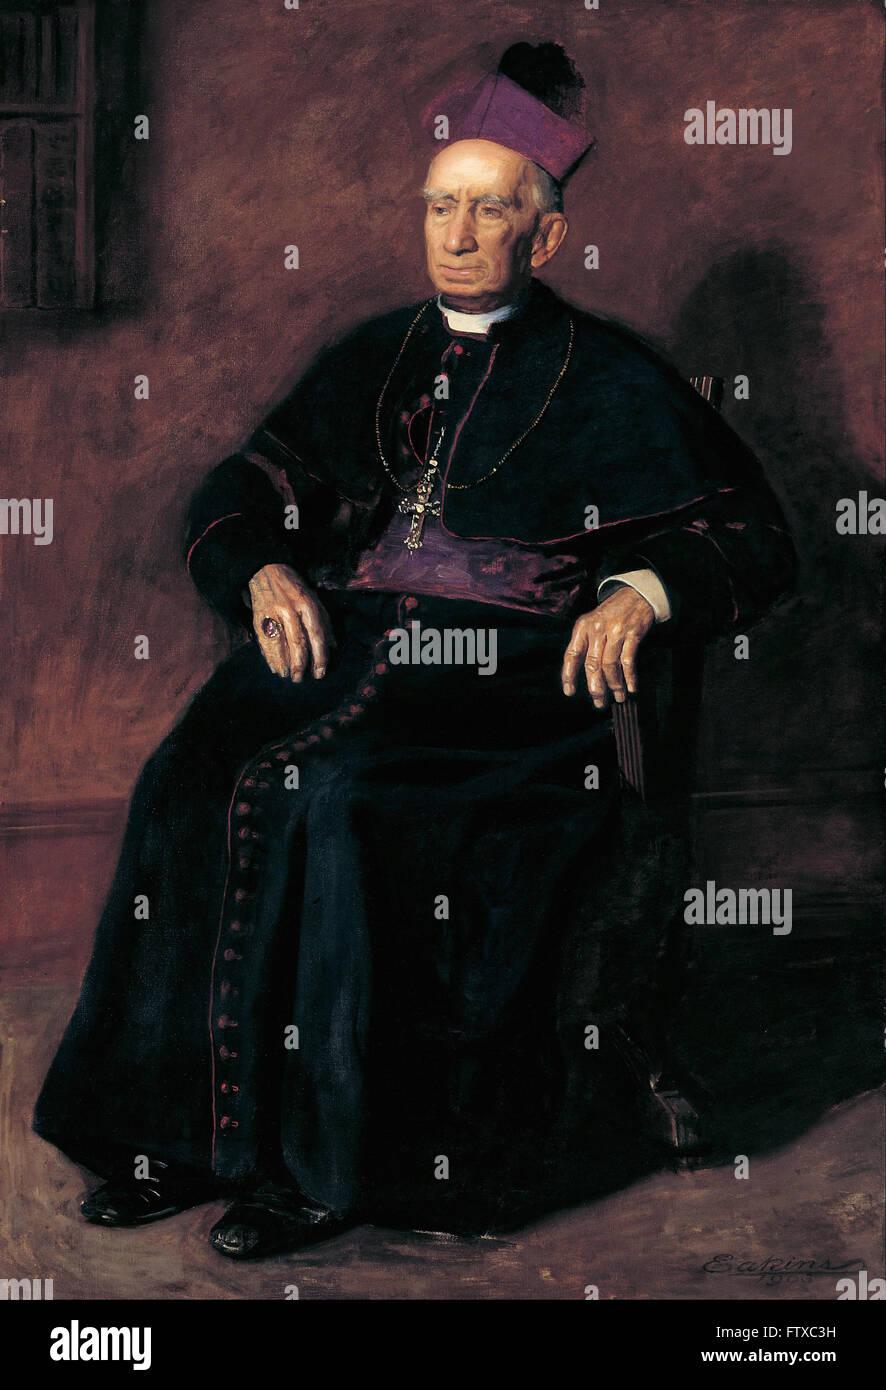 Thomas Eakins - Archbishop William Henry Elder -  Cincinnati Art Museum - Stock Image